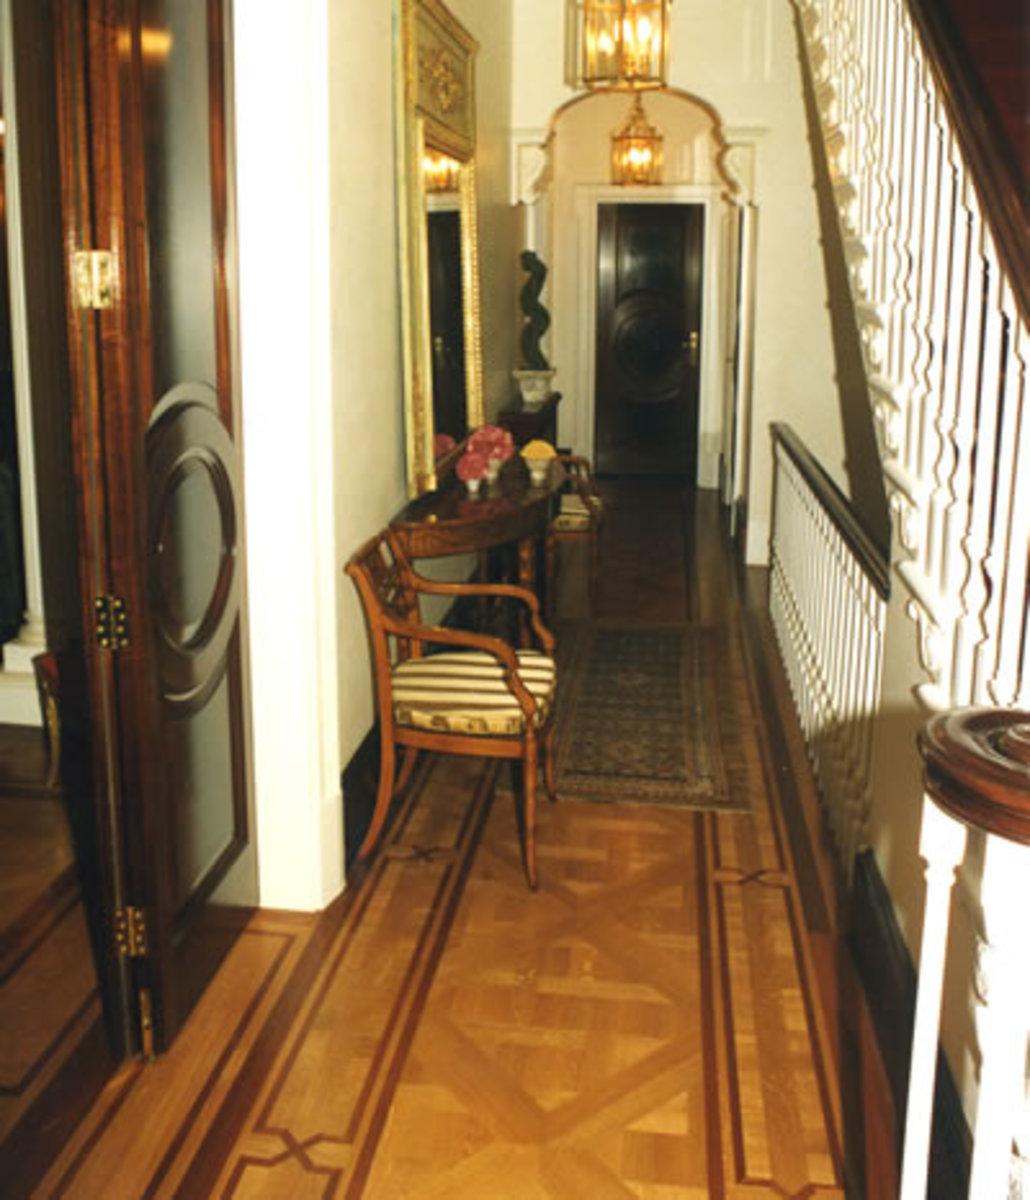 Decorative wood floor with border design - dark wood inlay